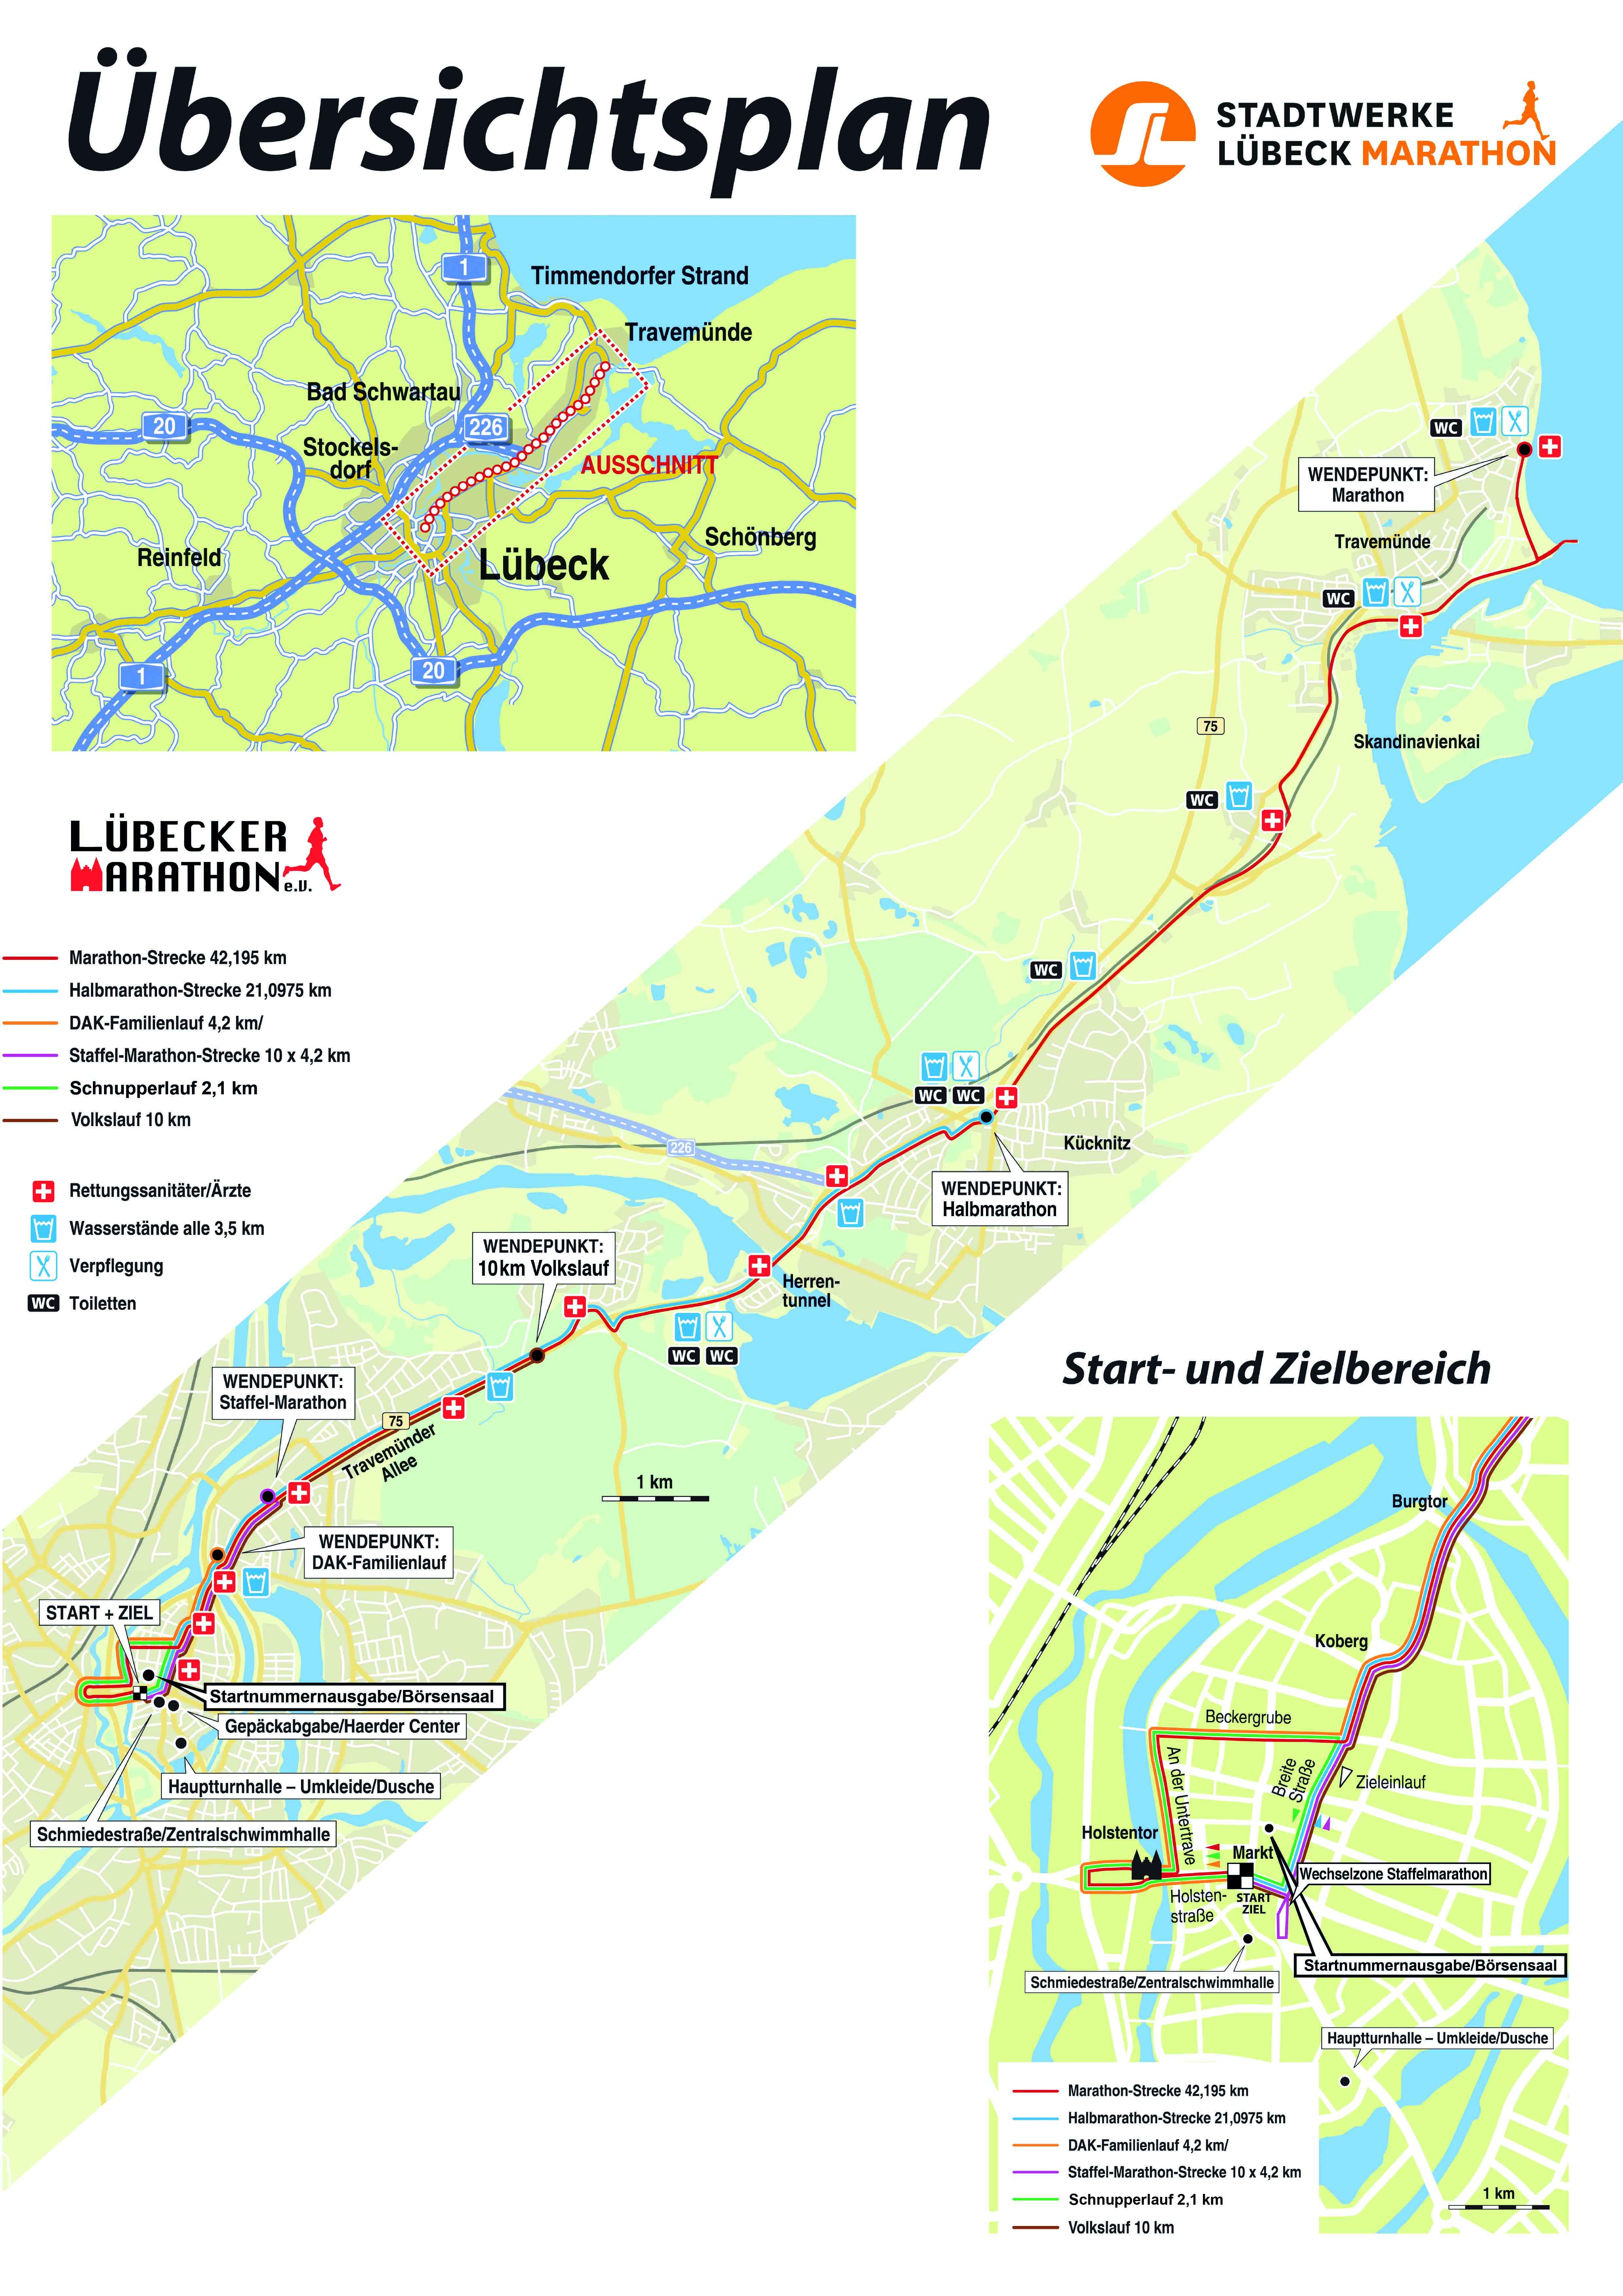 Karte Lübeck.Stadtwerke Lübeck Marathon Informationen Stadtwerke Lübeck Marathon